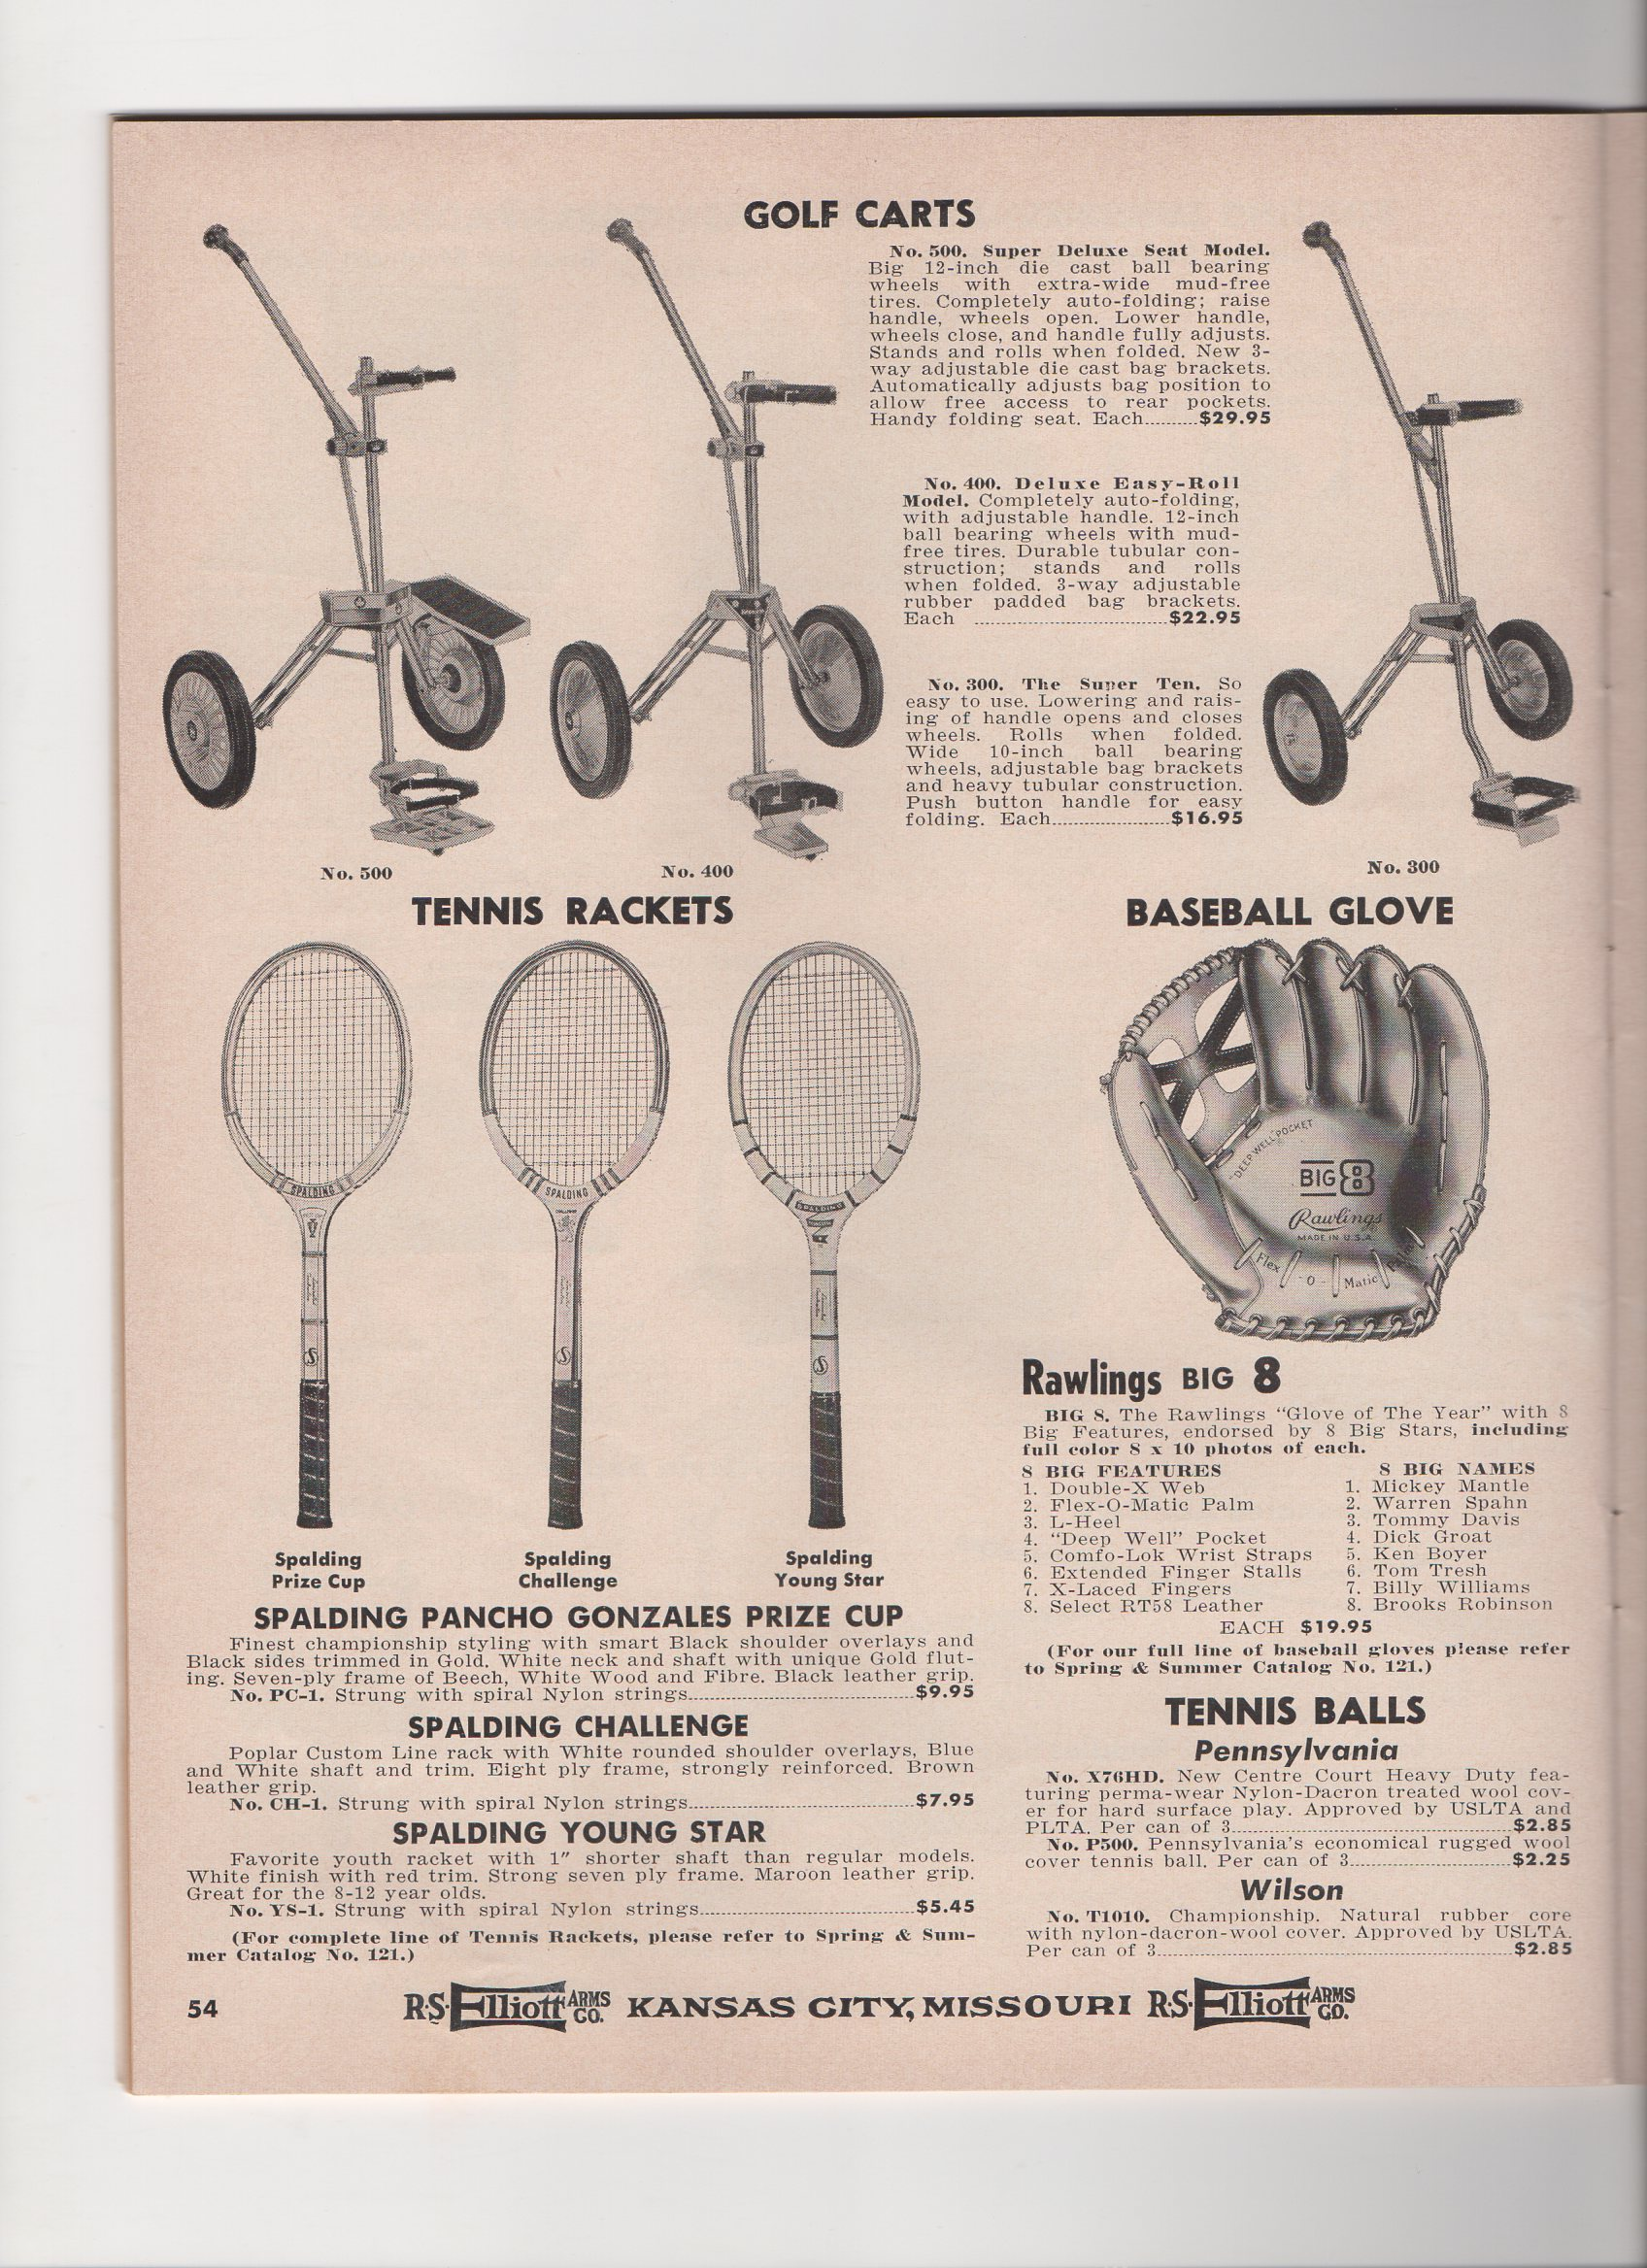 1964 elliott catalog, fall and winter, no. 122